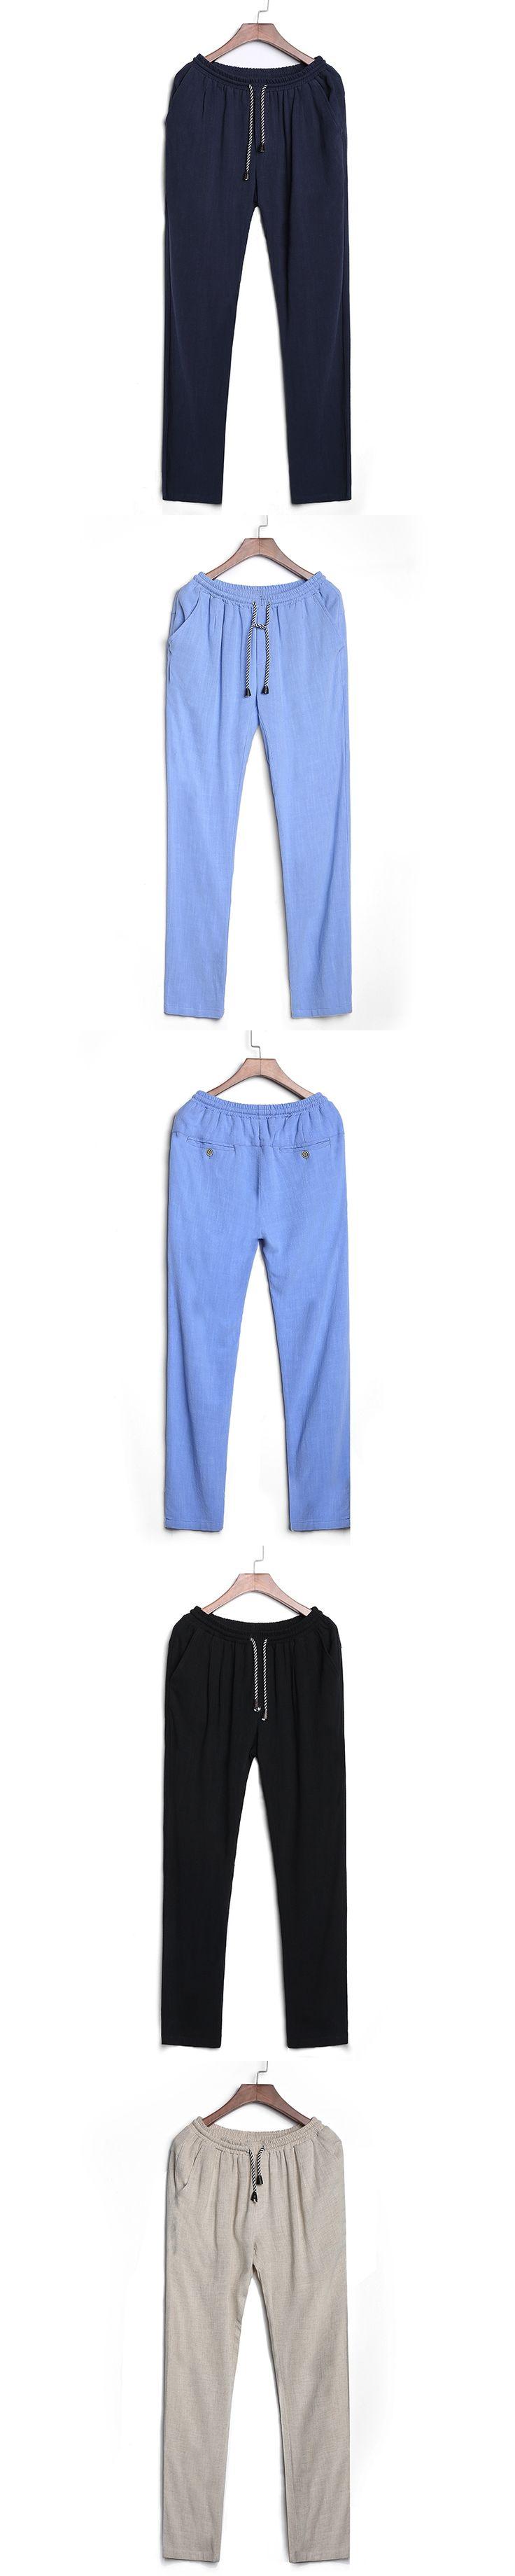 brand-clothing 2017 Mens Linen Pants Loose Cotton Straight Trousers big size men pants 4XL joggers pants Breathable sweatpants